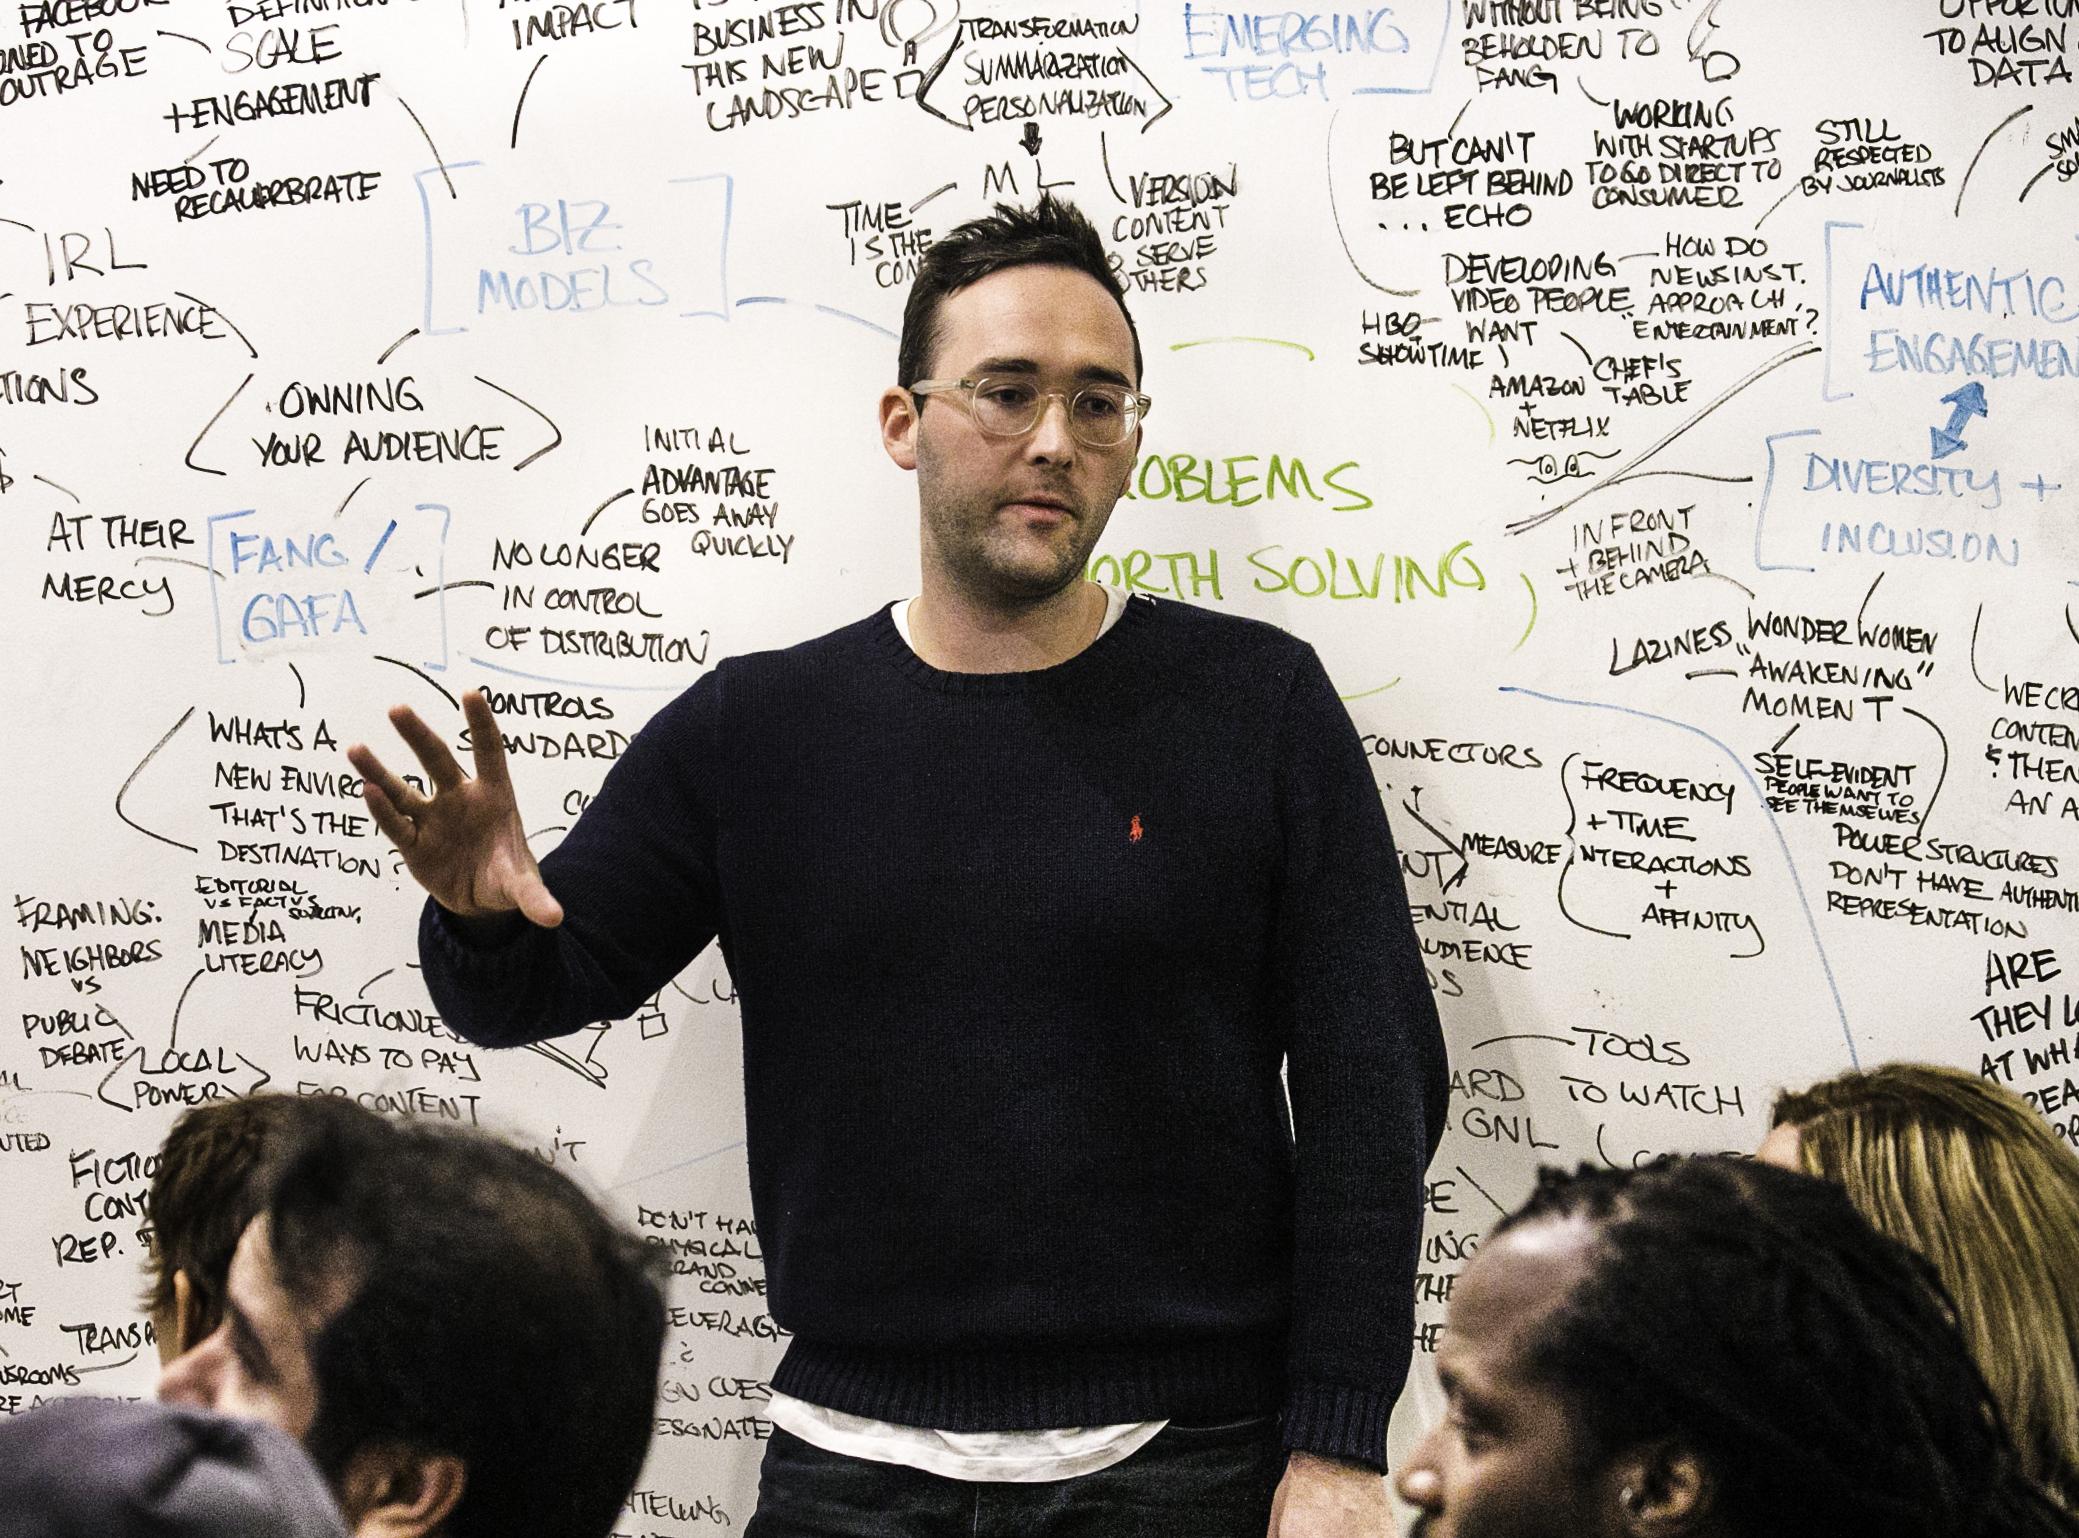 Communities Defining the Future Series - Community Member